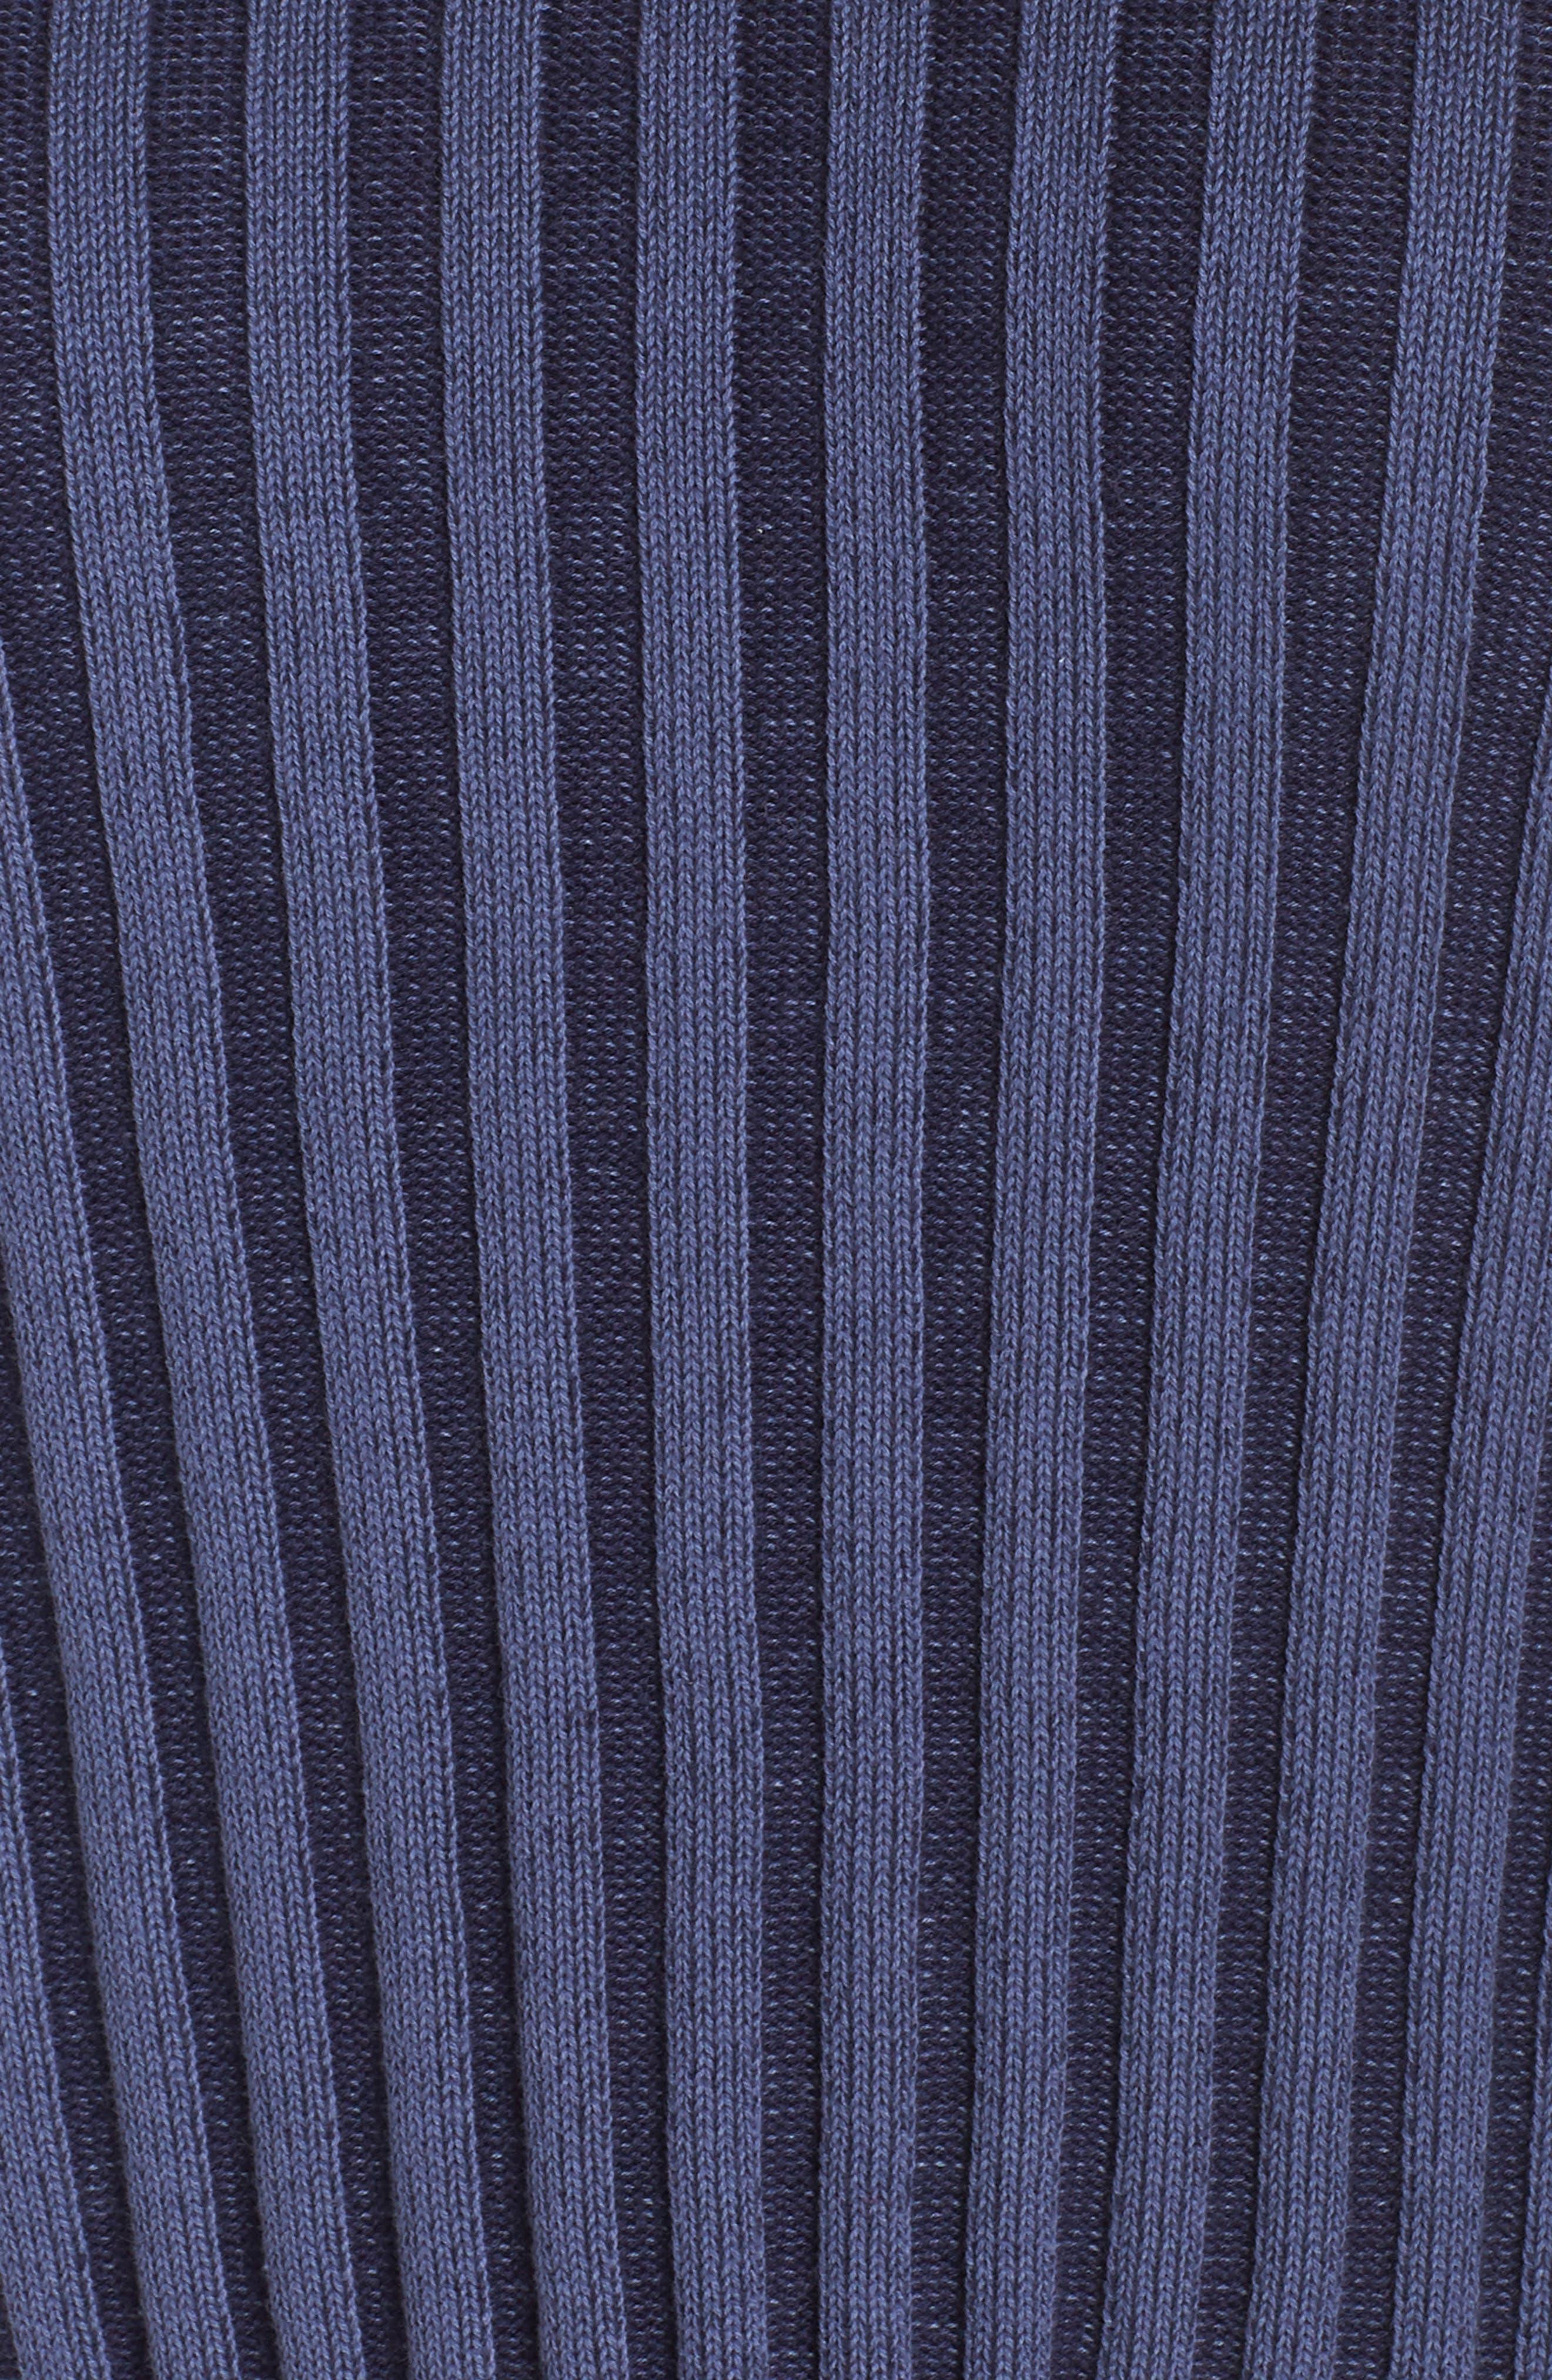 Shadow Rib Crop Sweater,                             Alternate thumbnail 11, color,                             NAVY EVENING